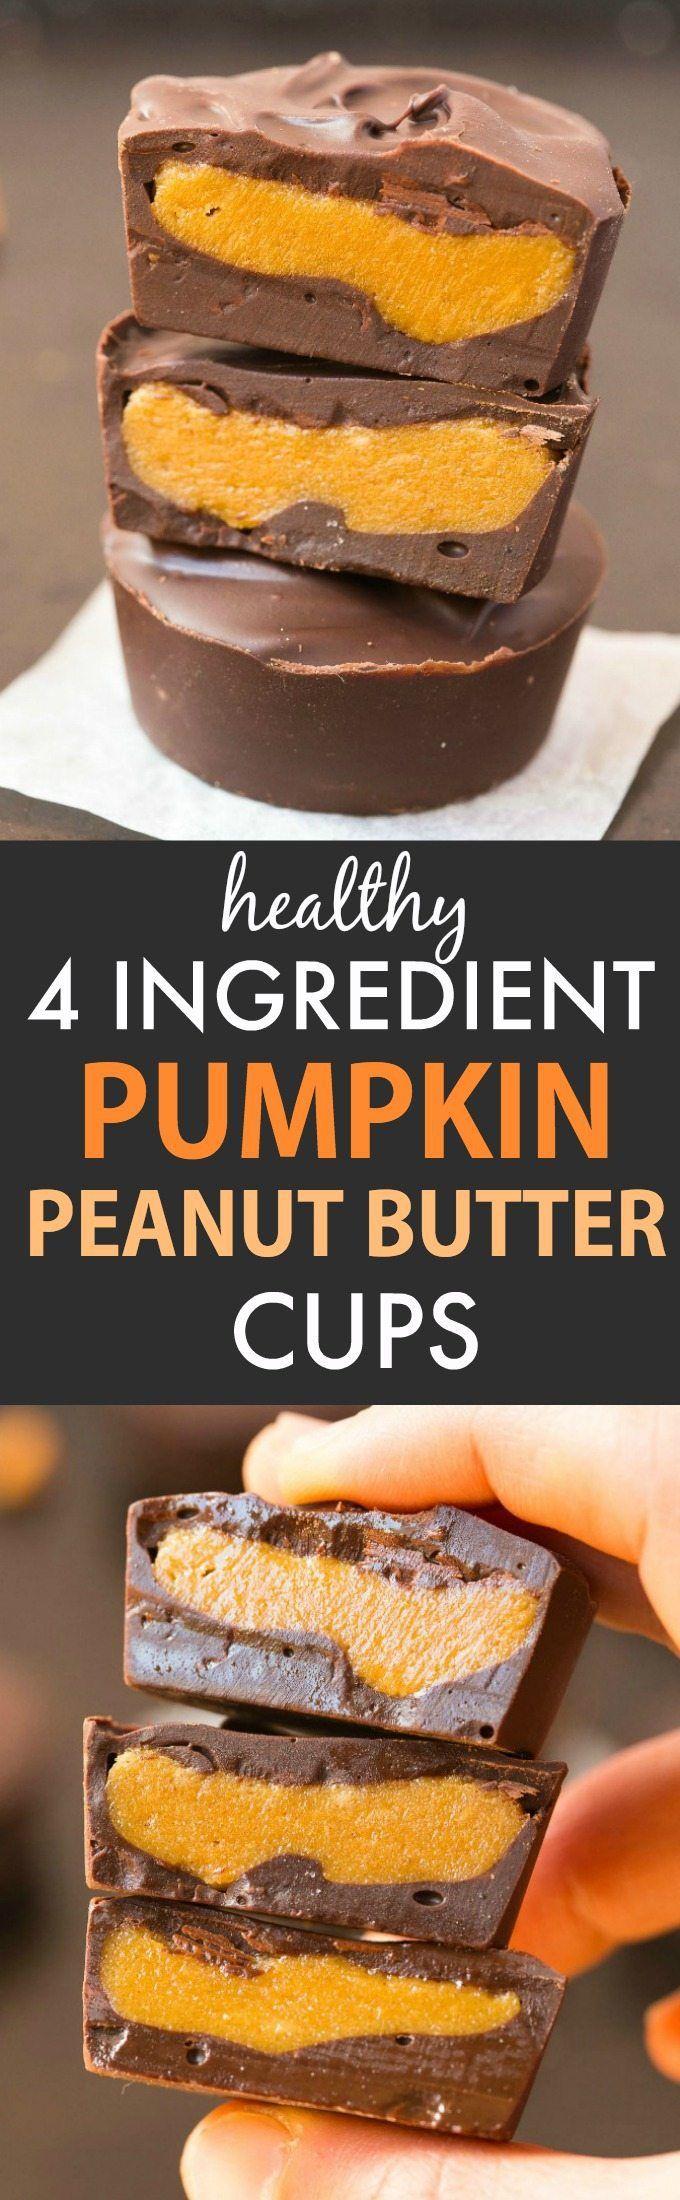 Healthy 4-Ingredient Pumpkin Peanut Butter Cups (V, GF, DF)- Easy, homemade pumpkin peanut butter cups BETTER than Reese's- A creamy fudgy center with a layer of chocolate! {vegan, gluten free, sugar free recipe}- thebigmansworld.com #pumpkin #peanutbutter